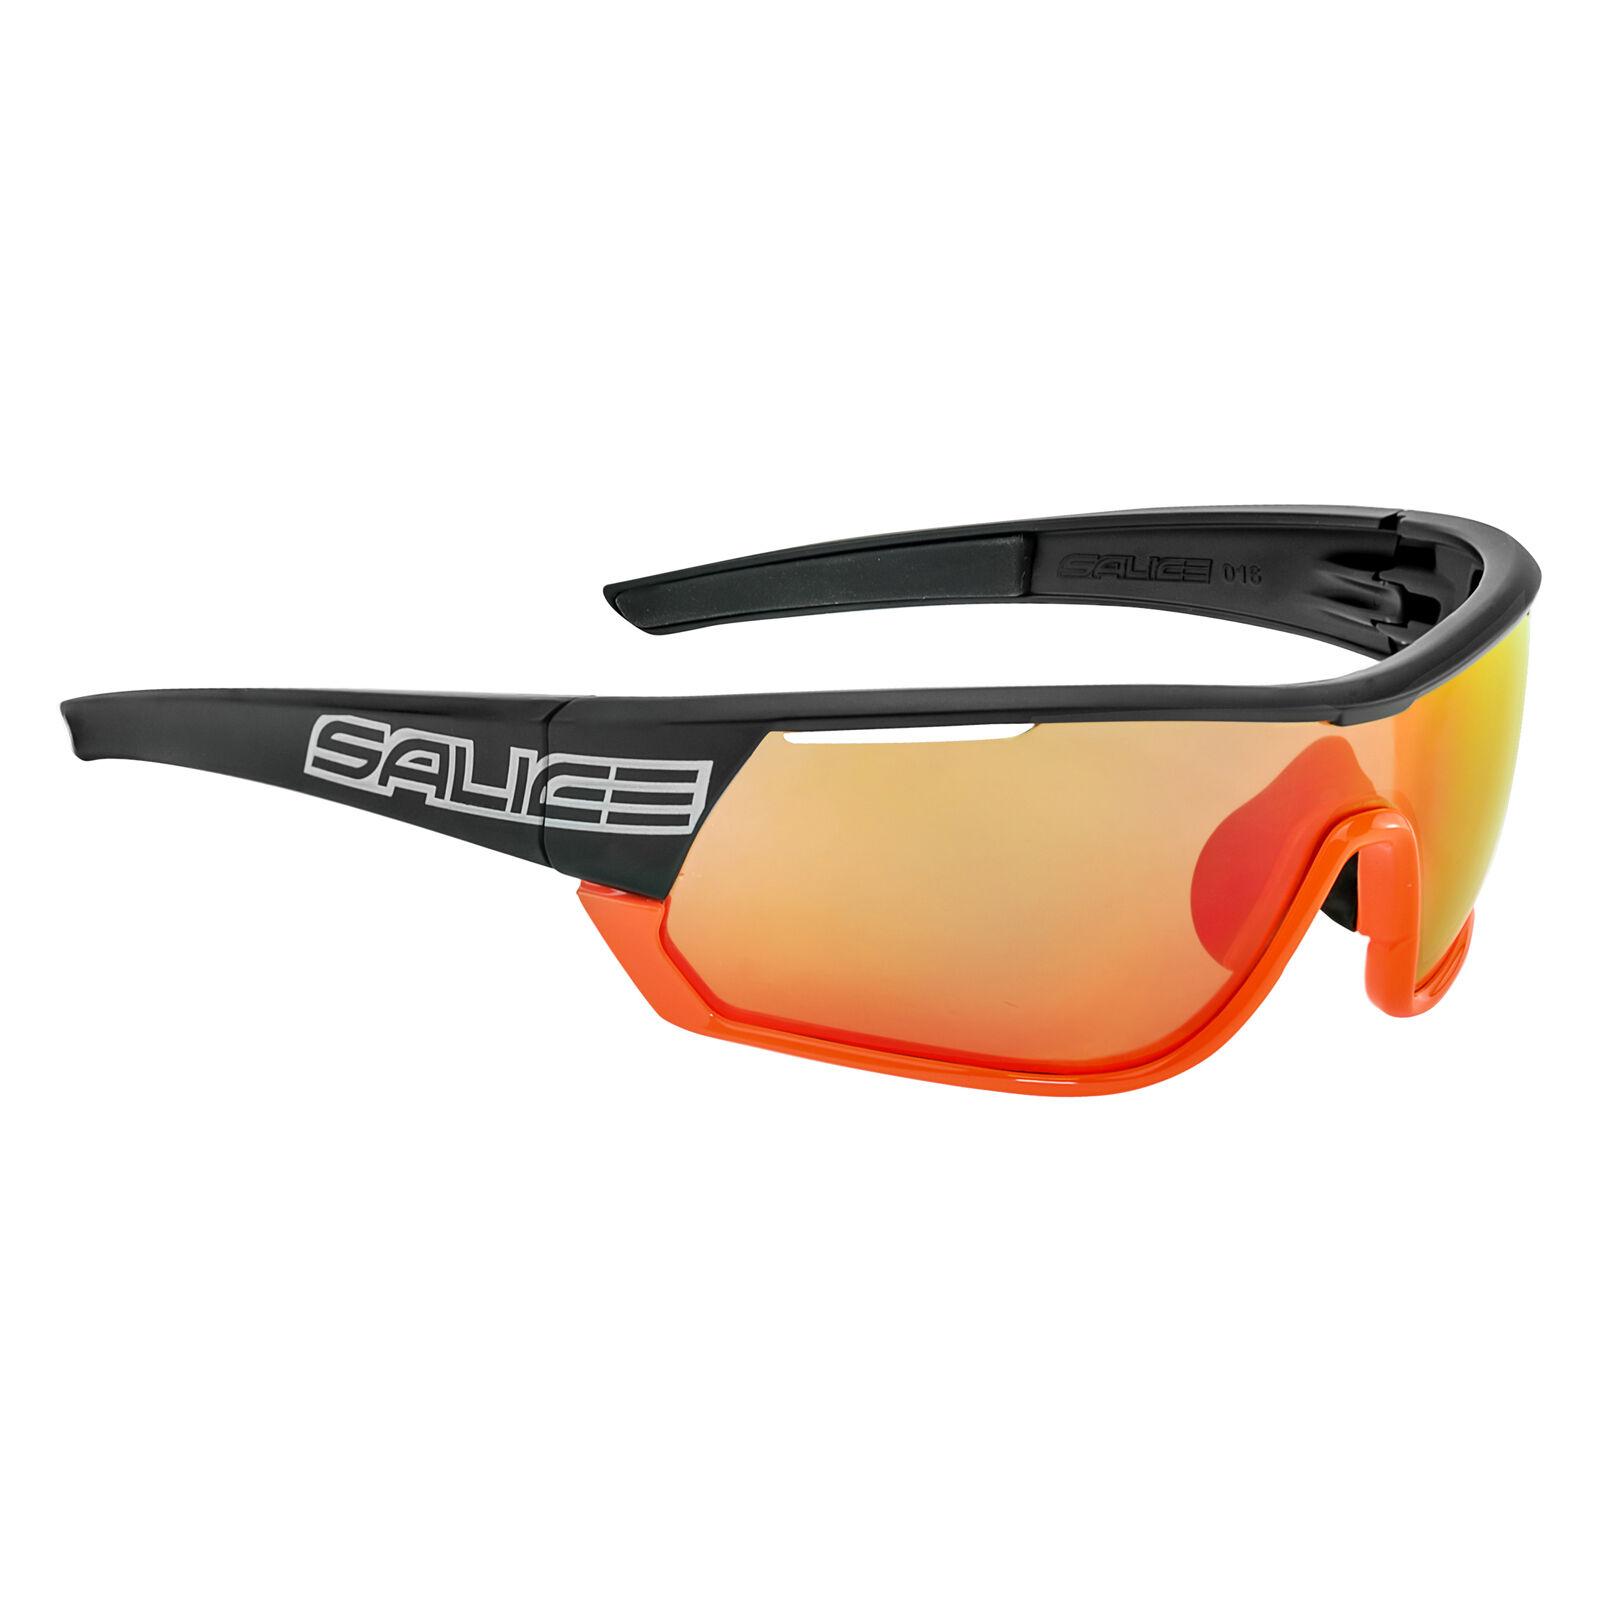 Salice 016 RW Mirror Sunglasses - Black/Orange/Red